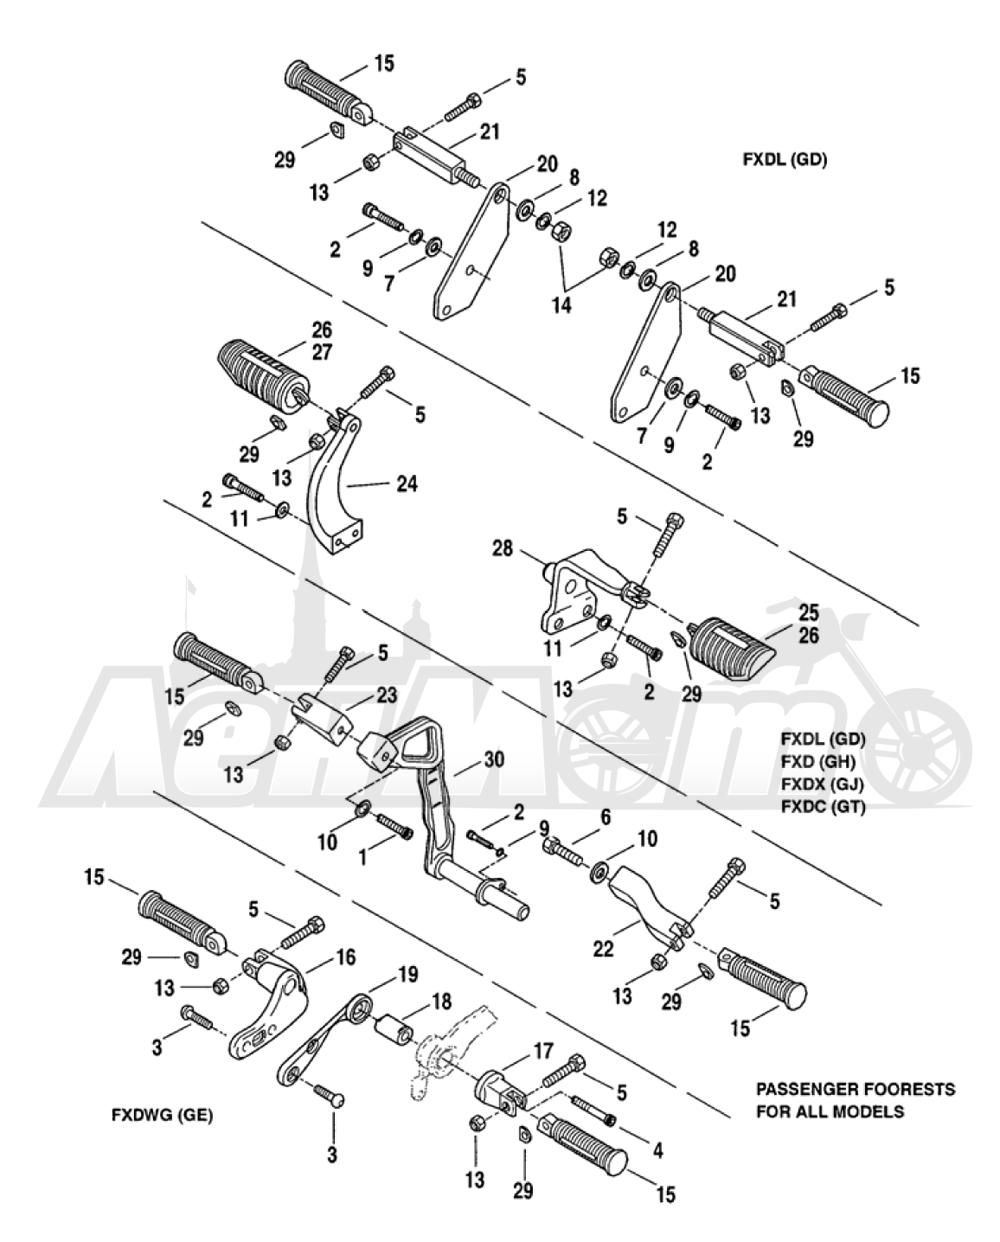 Запчасти для Мотоцикла Harley-Davidson 2005 FXDLI DYNA® LOW RIDER (INJECTION) (GN) Раздел: FOOTRESTS ASSEMBLY | подножки в сборе